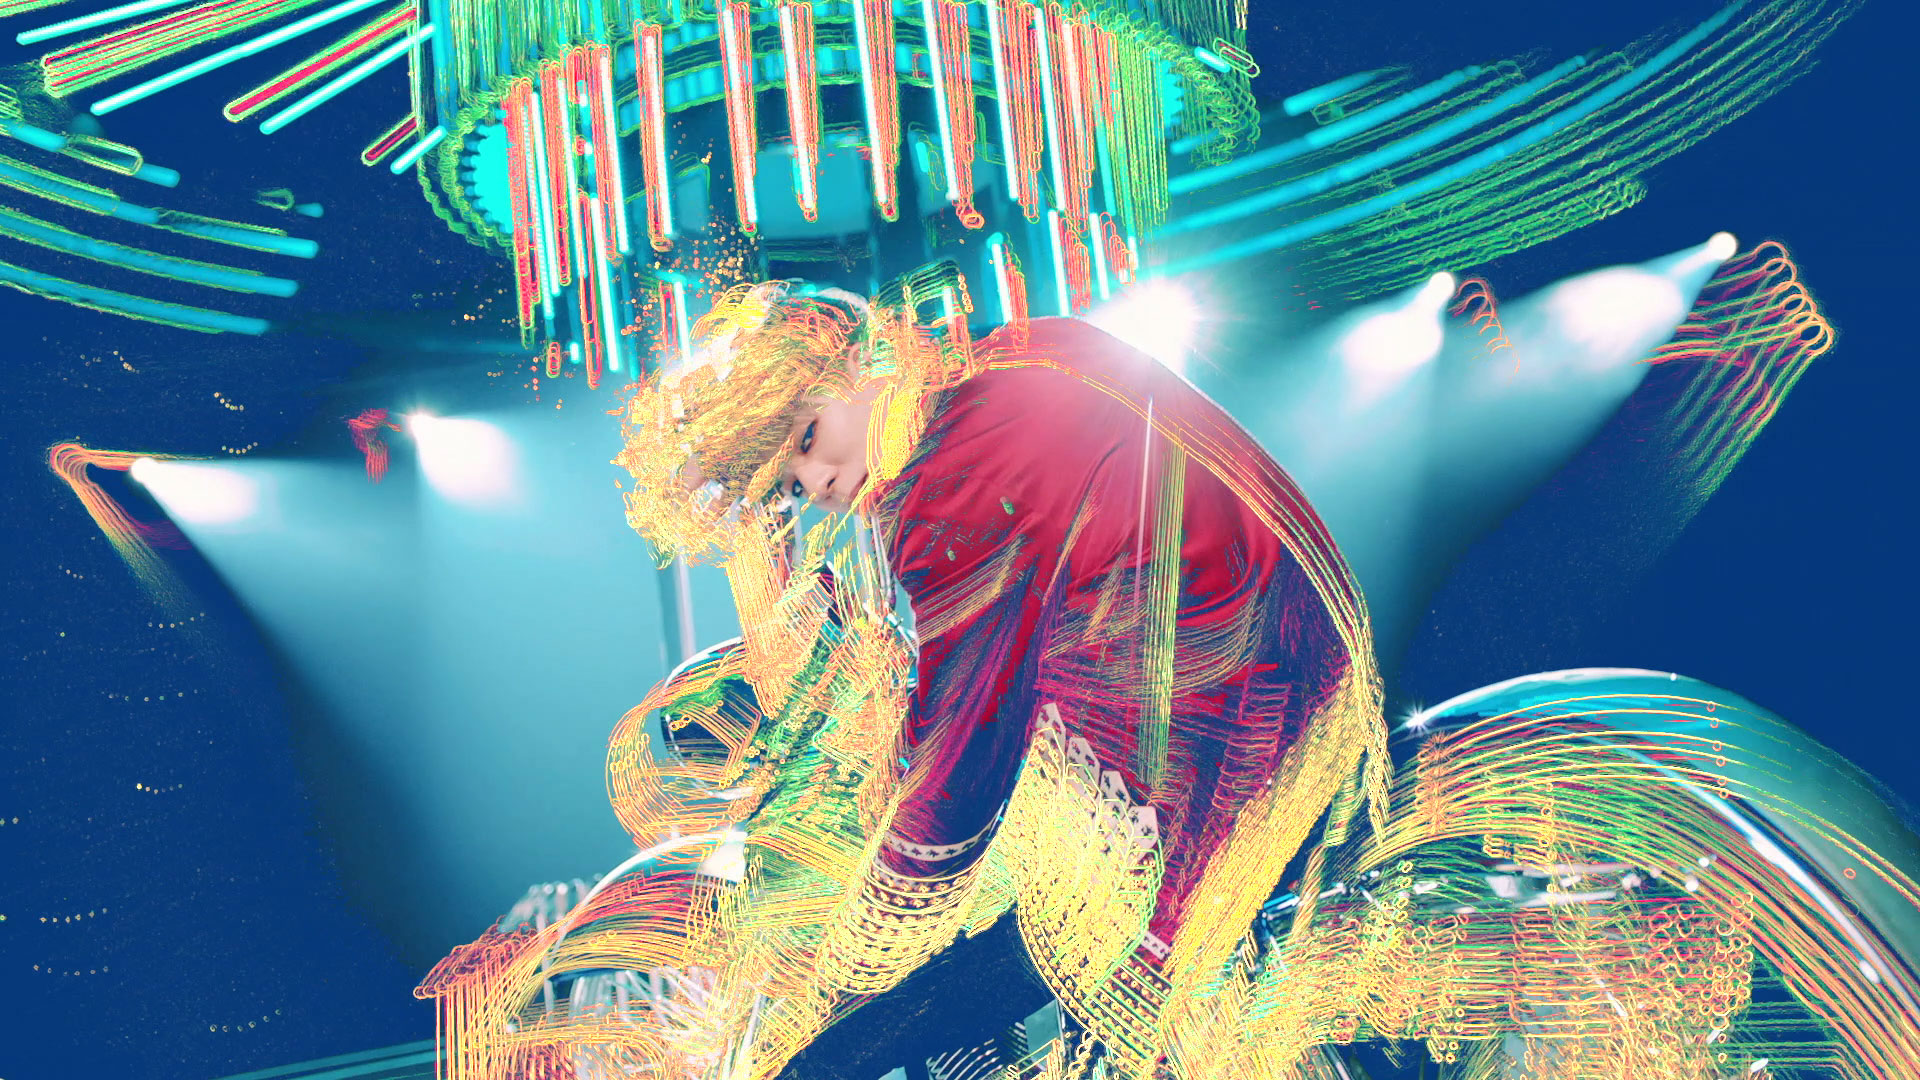 NCT DREAM 엔시티 드림 'Ridin' (Will Not Fear Remix)' MV